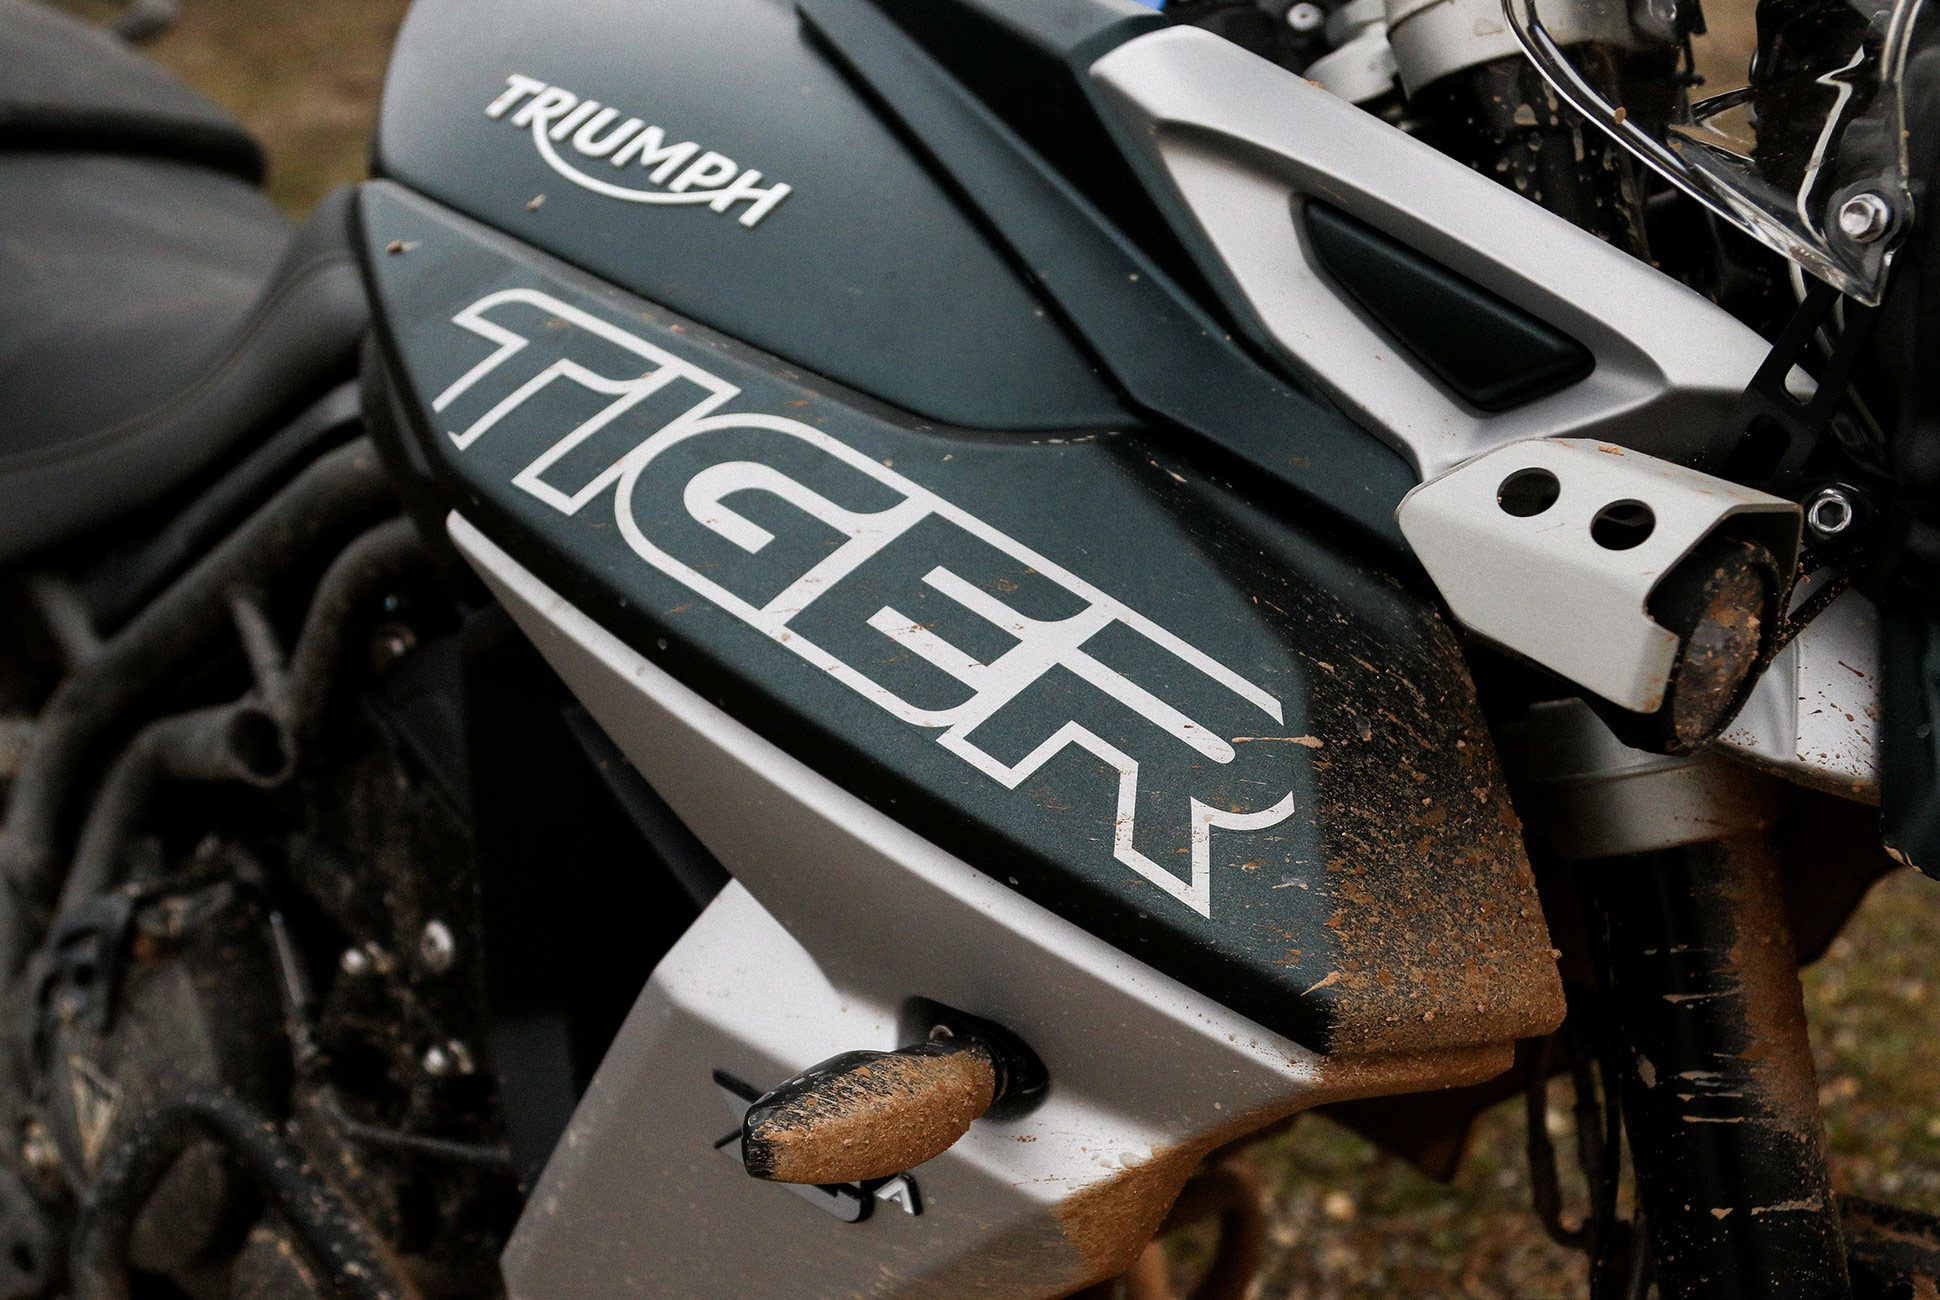 Triumph-Tiger-800-Review-gear-patrol-slide-11